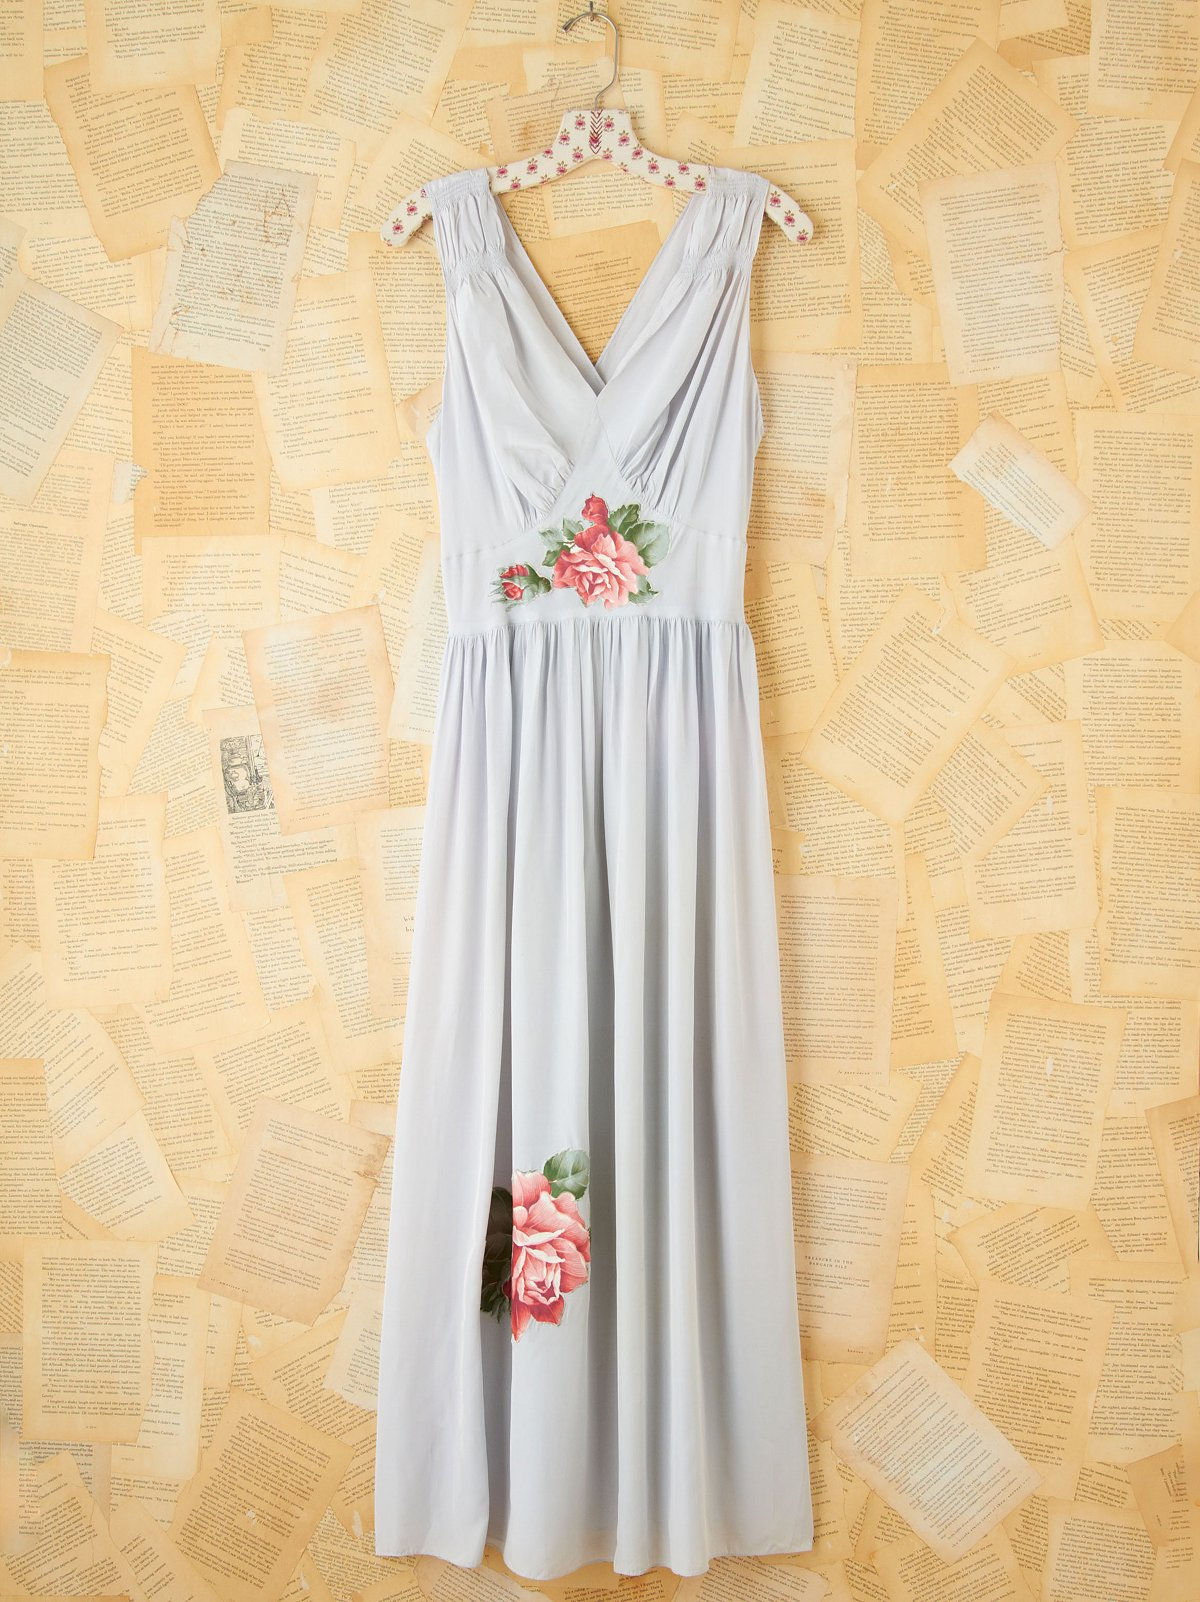 Vintage Floral Appliqu Maxi Slip Dress